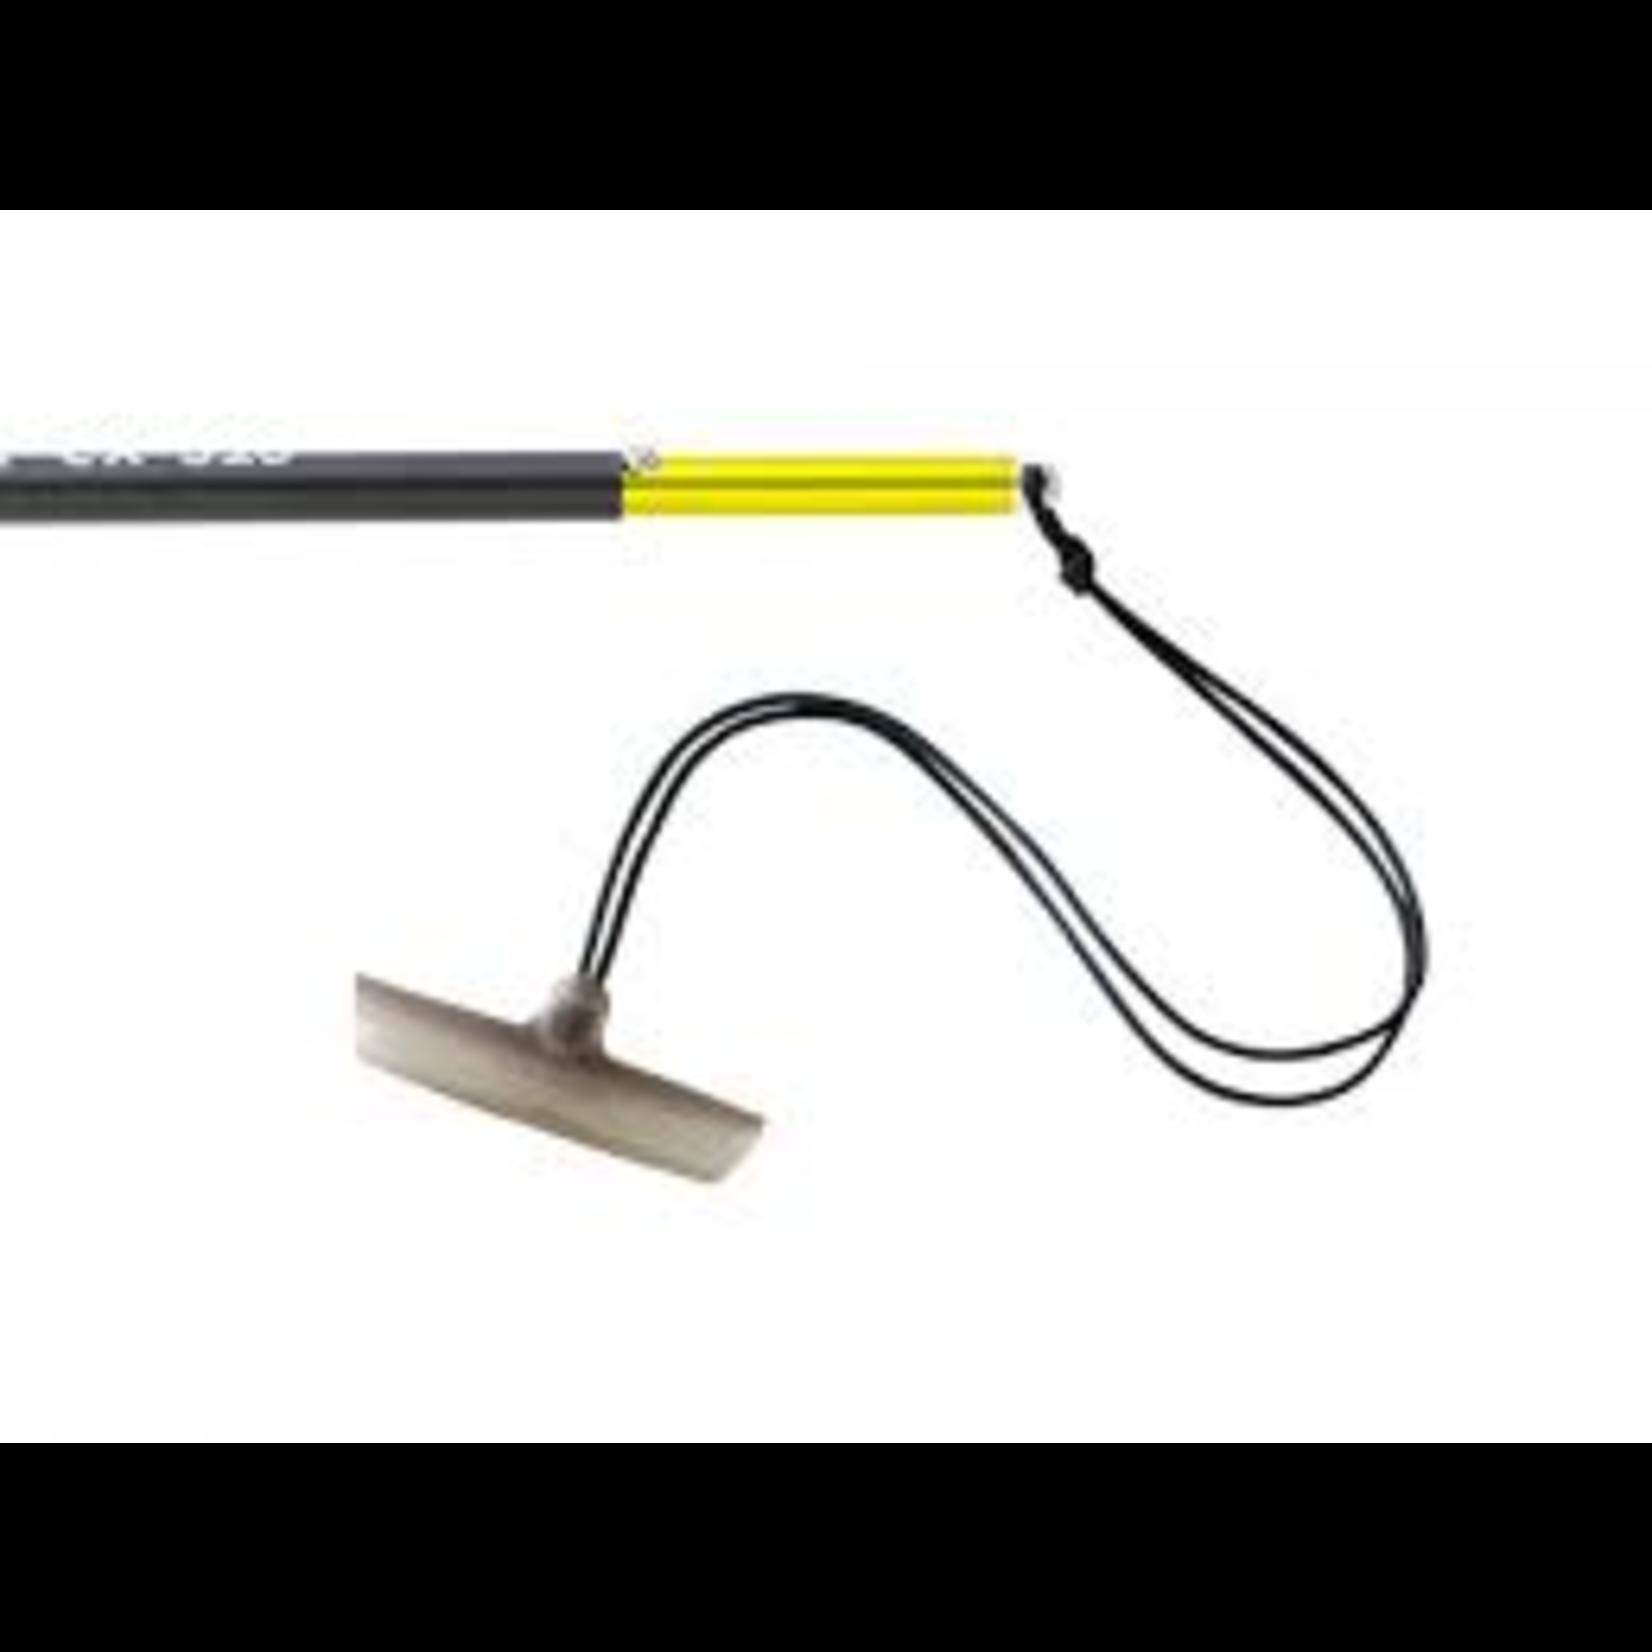 MSR Striker™ 240 Probe